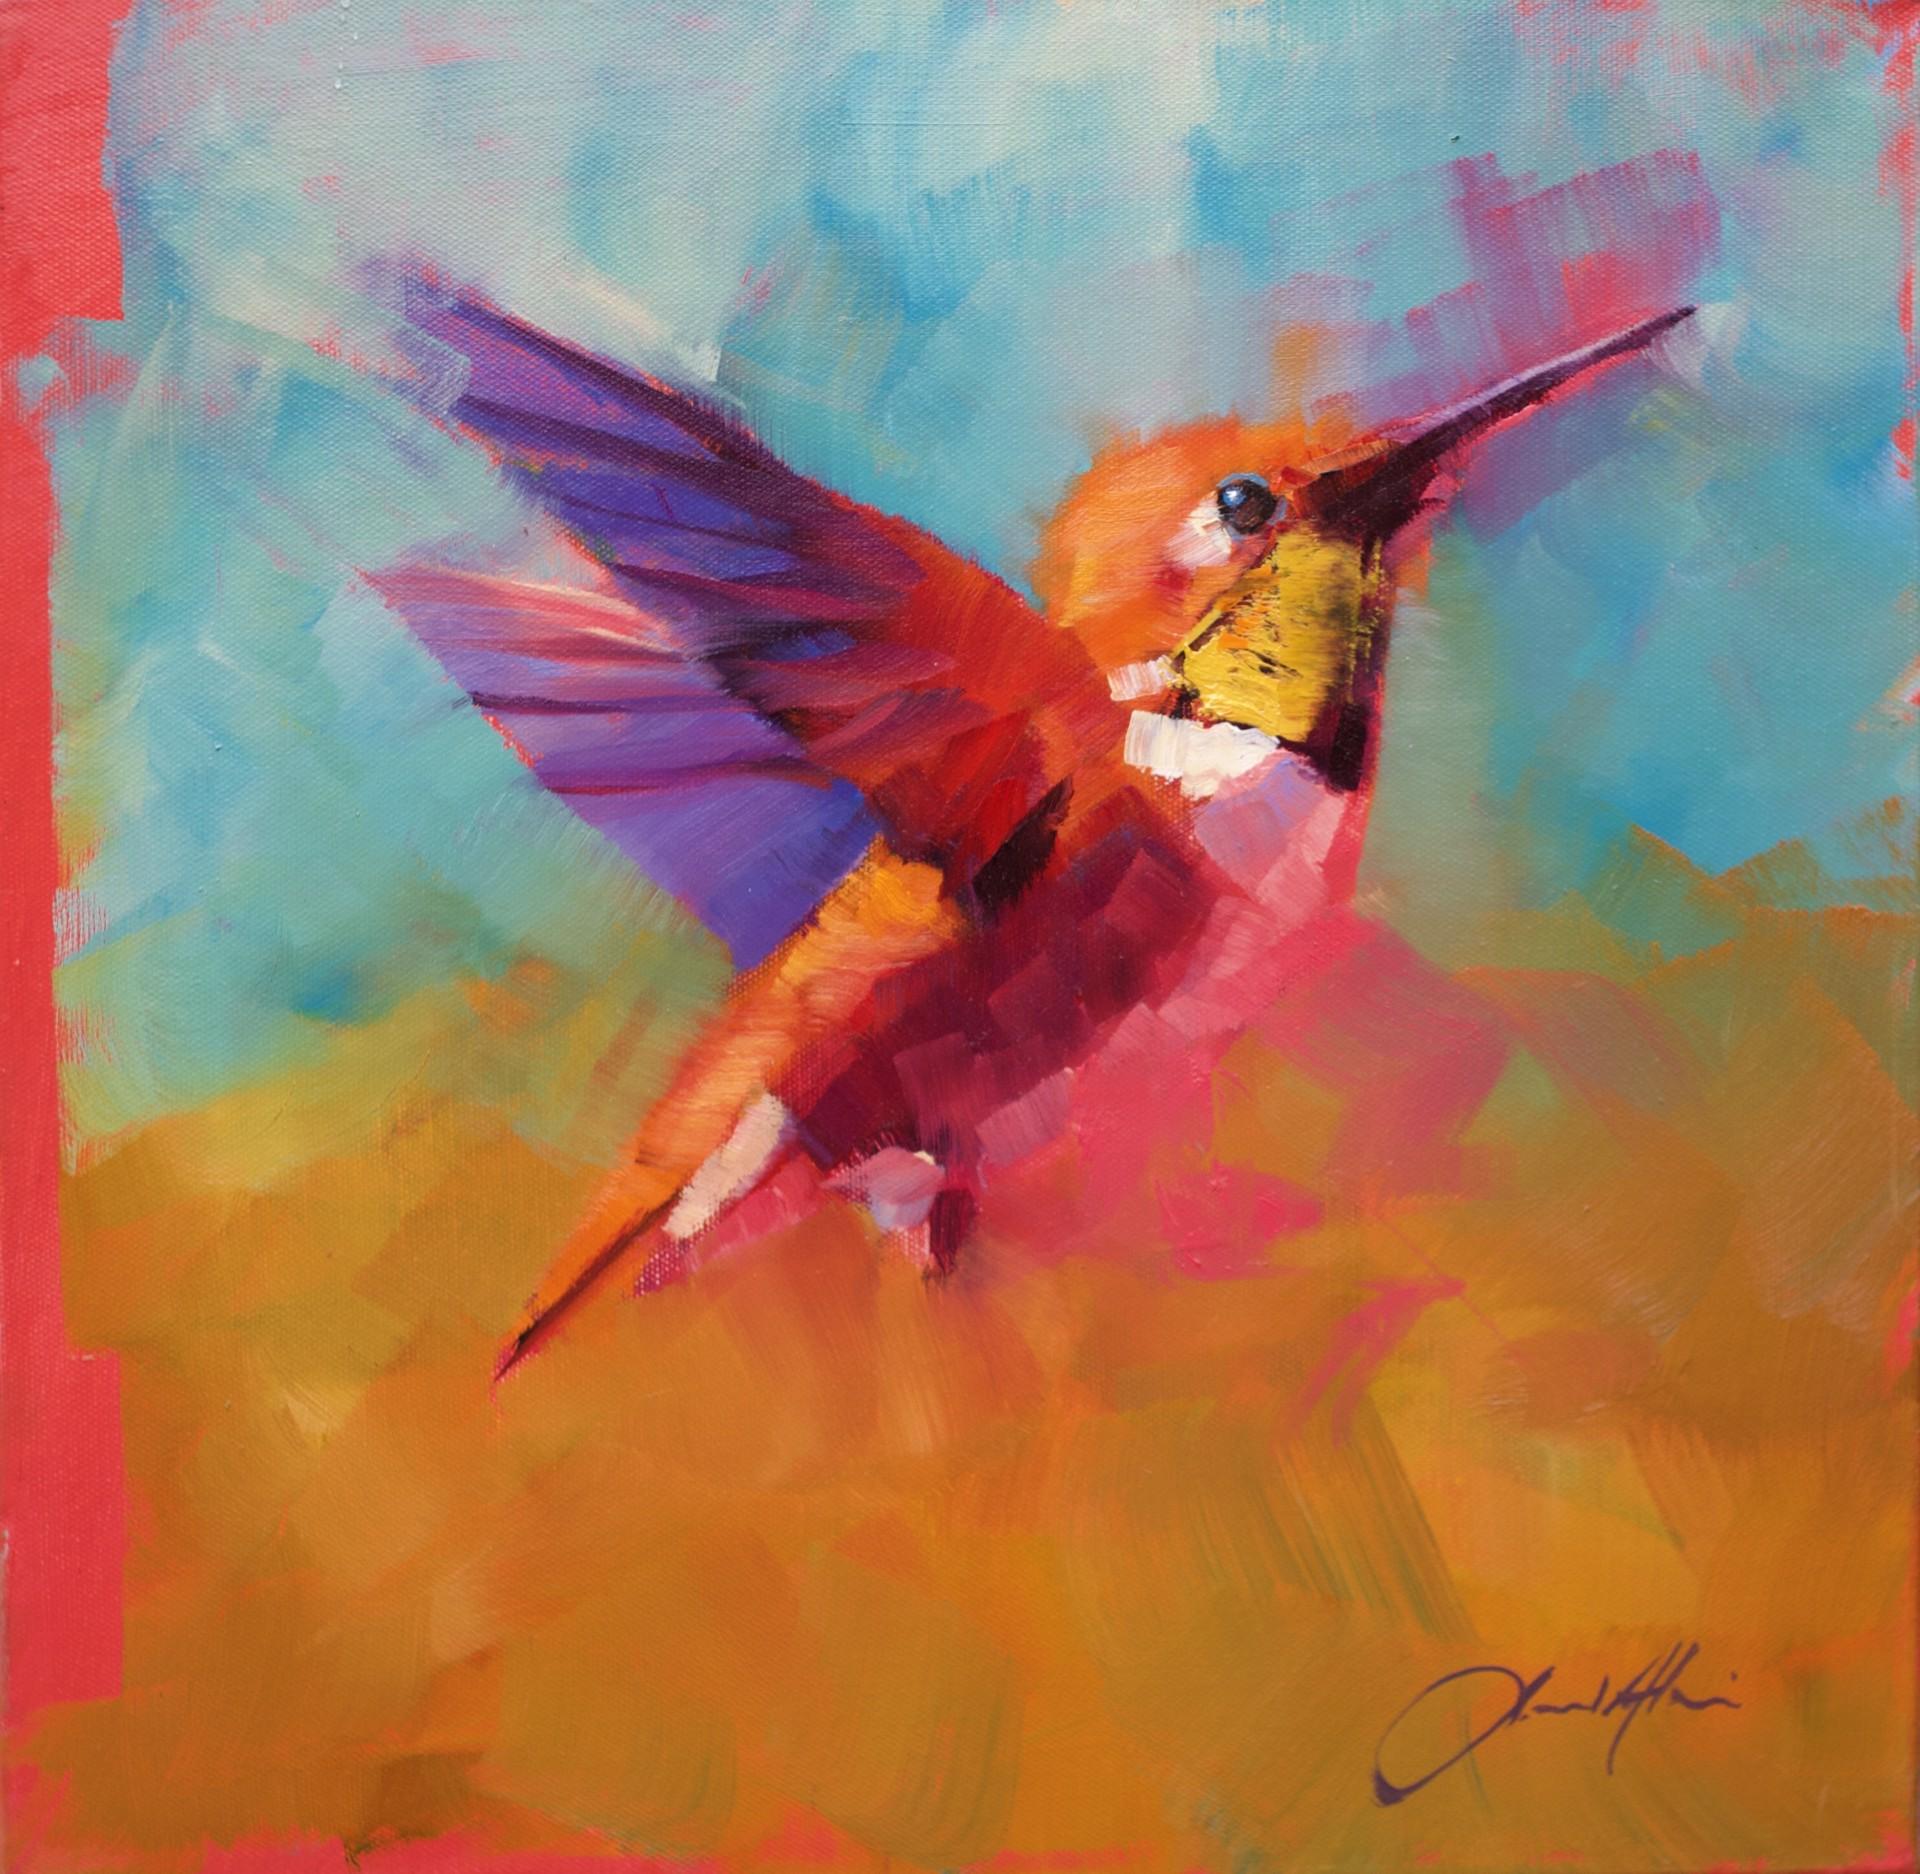 Hummingbird XII by Jamel Akib